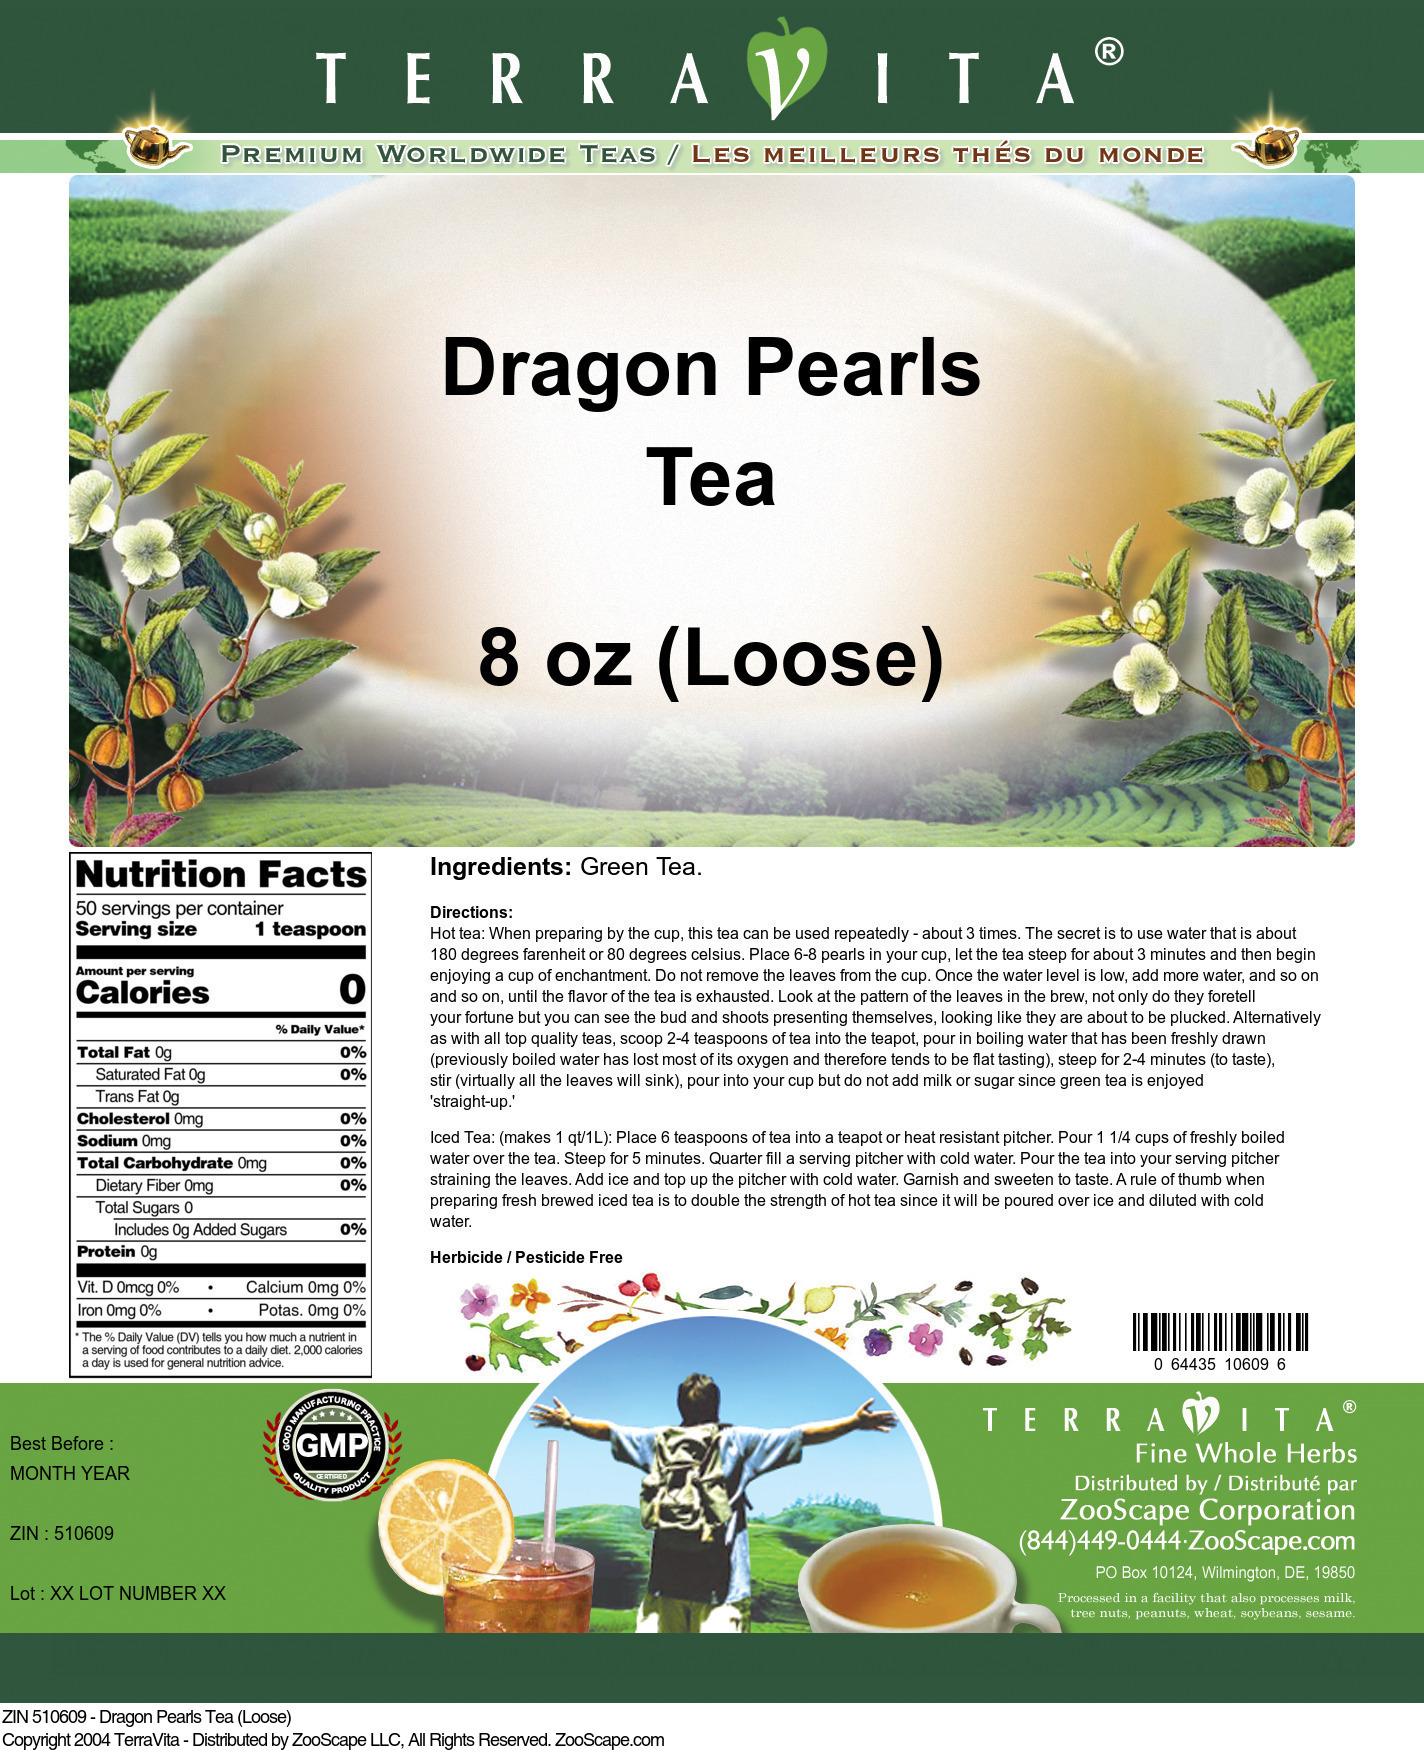 Dragon Pearls Tea (Loose)